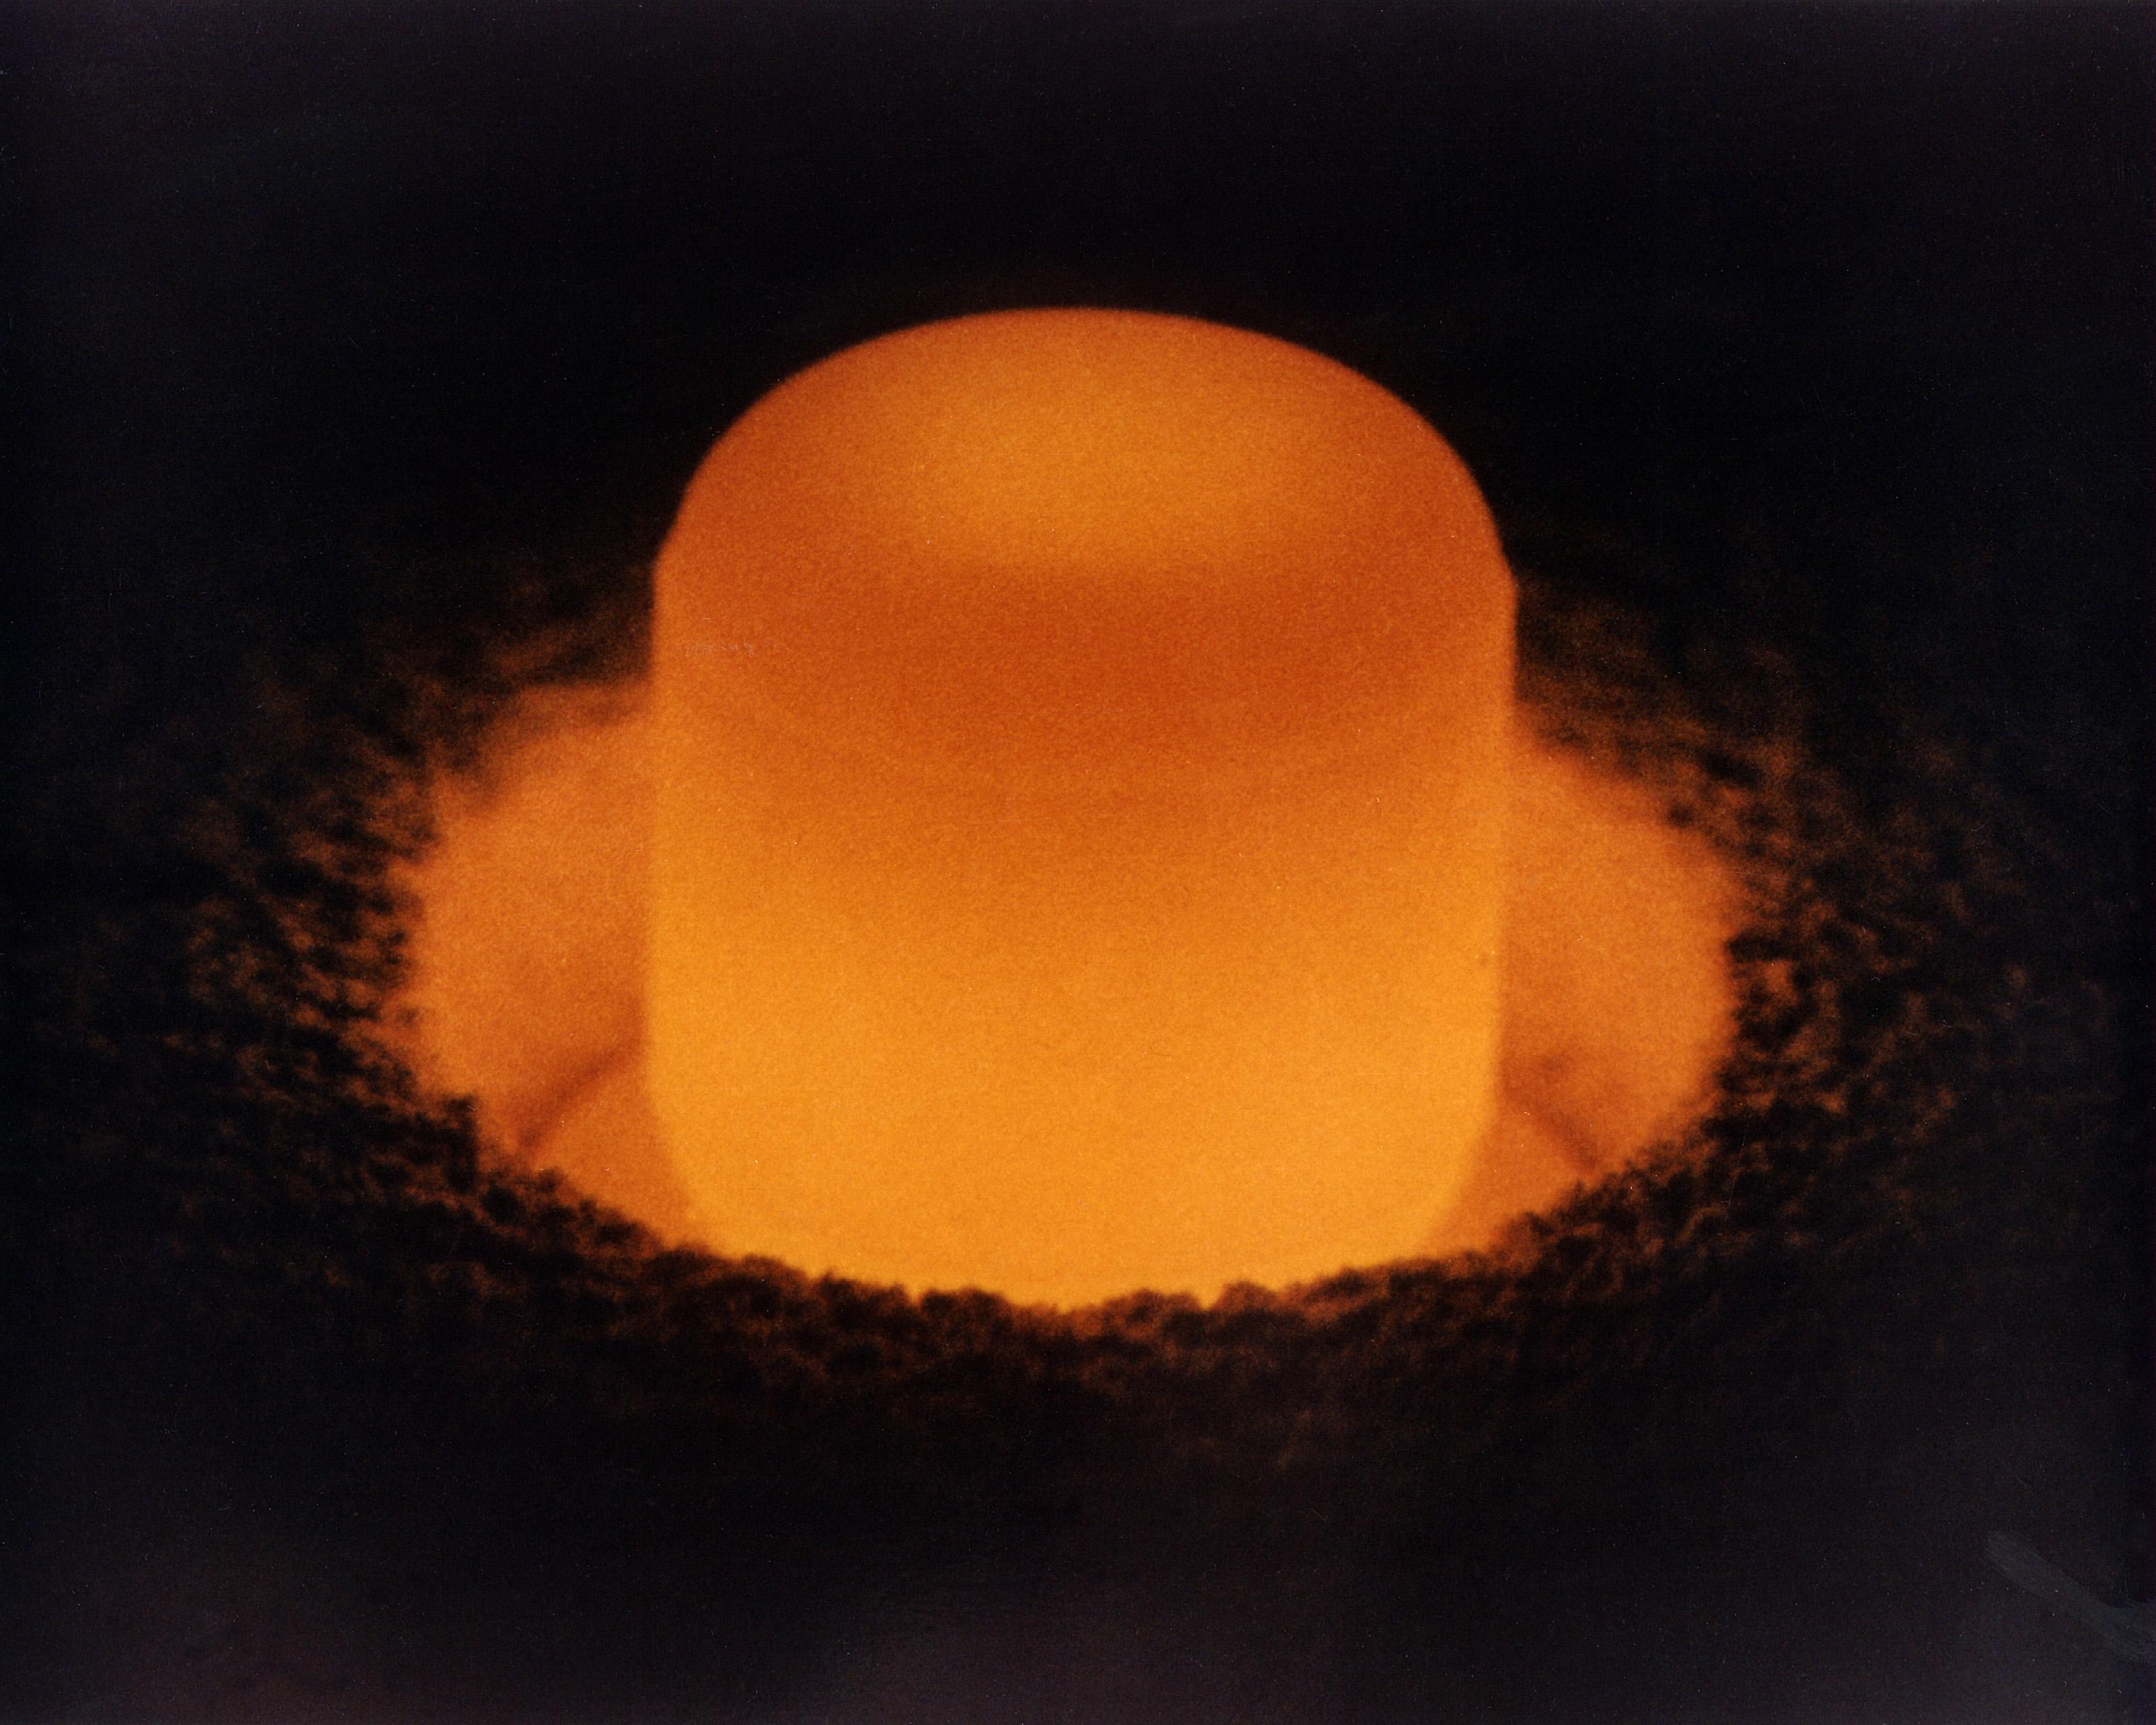 File:Plutonium pellet.jpg